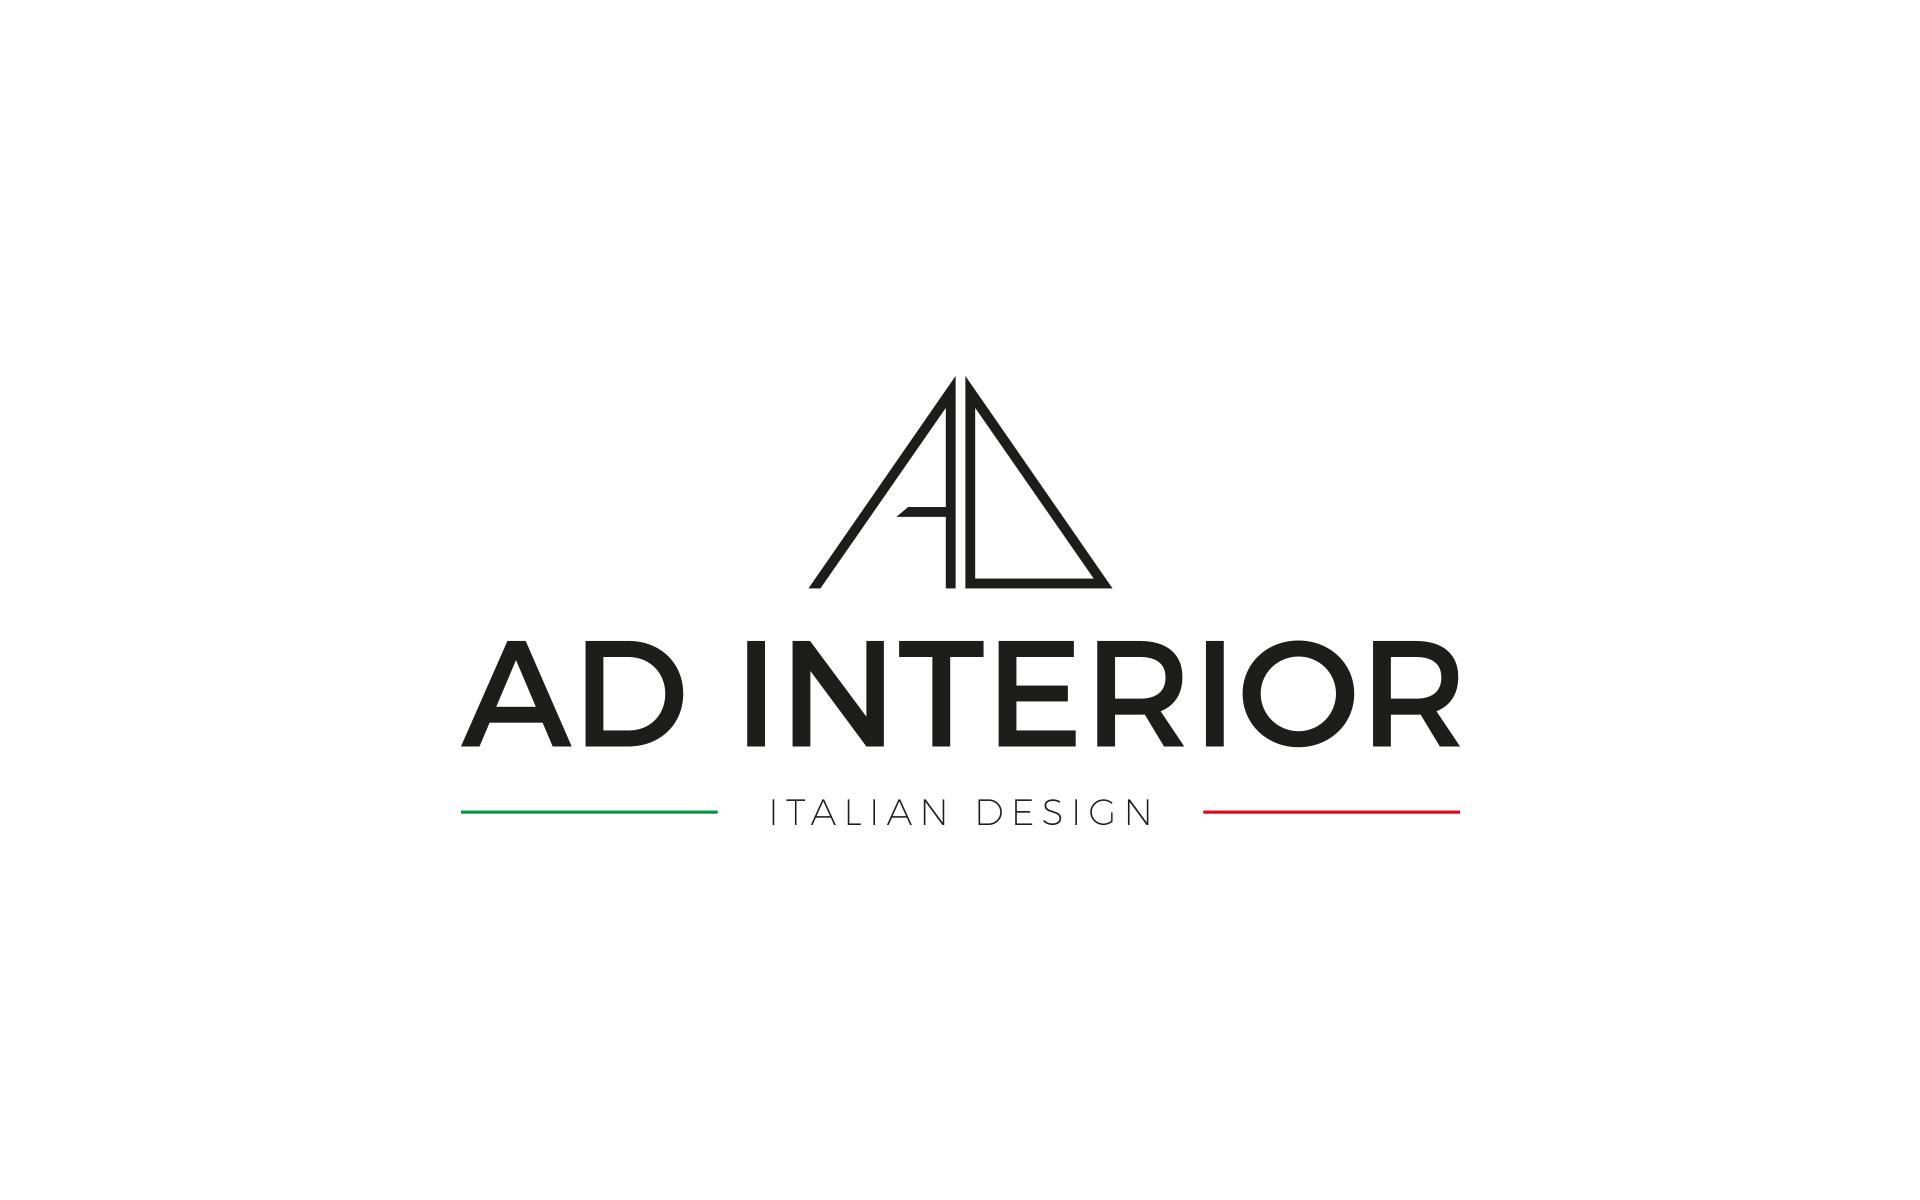 mood-d project ad interior creative agency 02.jpg